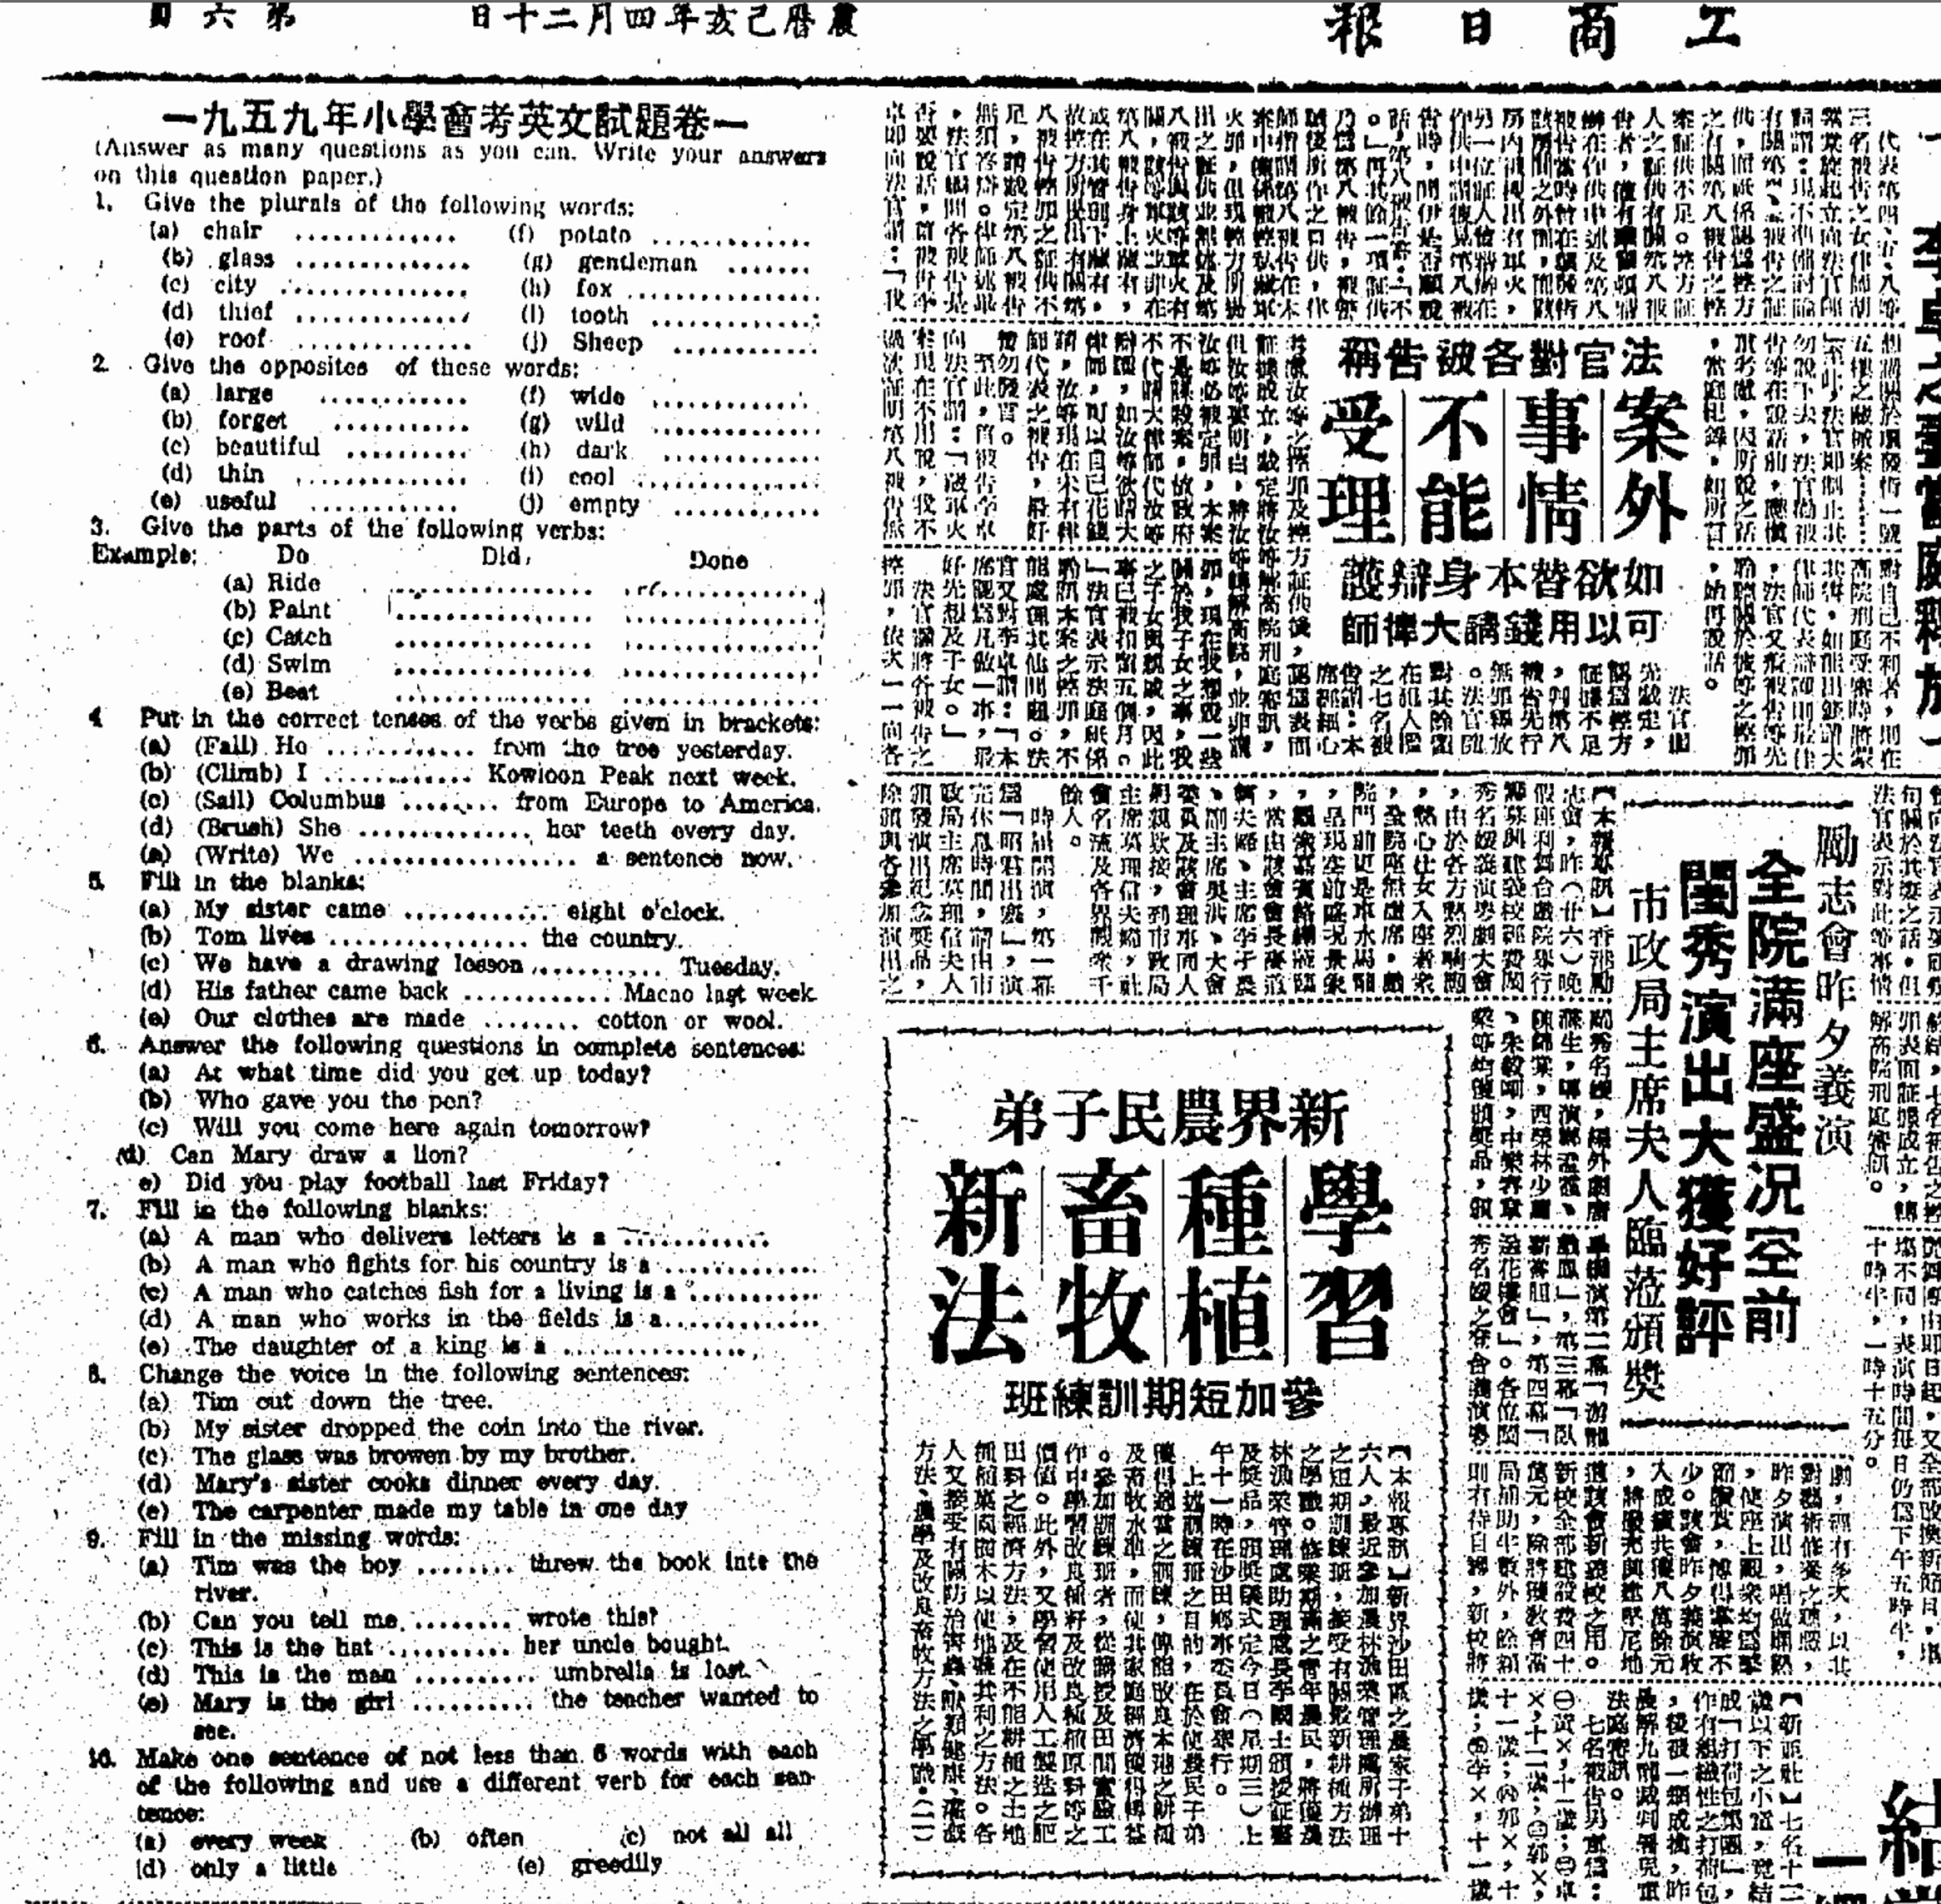 http://ubeat.com.cuhk.edu.hk/wp-content/uploads/2018/135_hkhistory_engexam.jpg